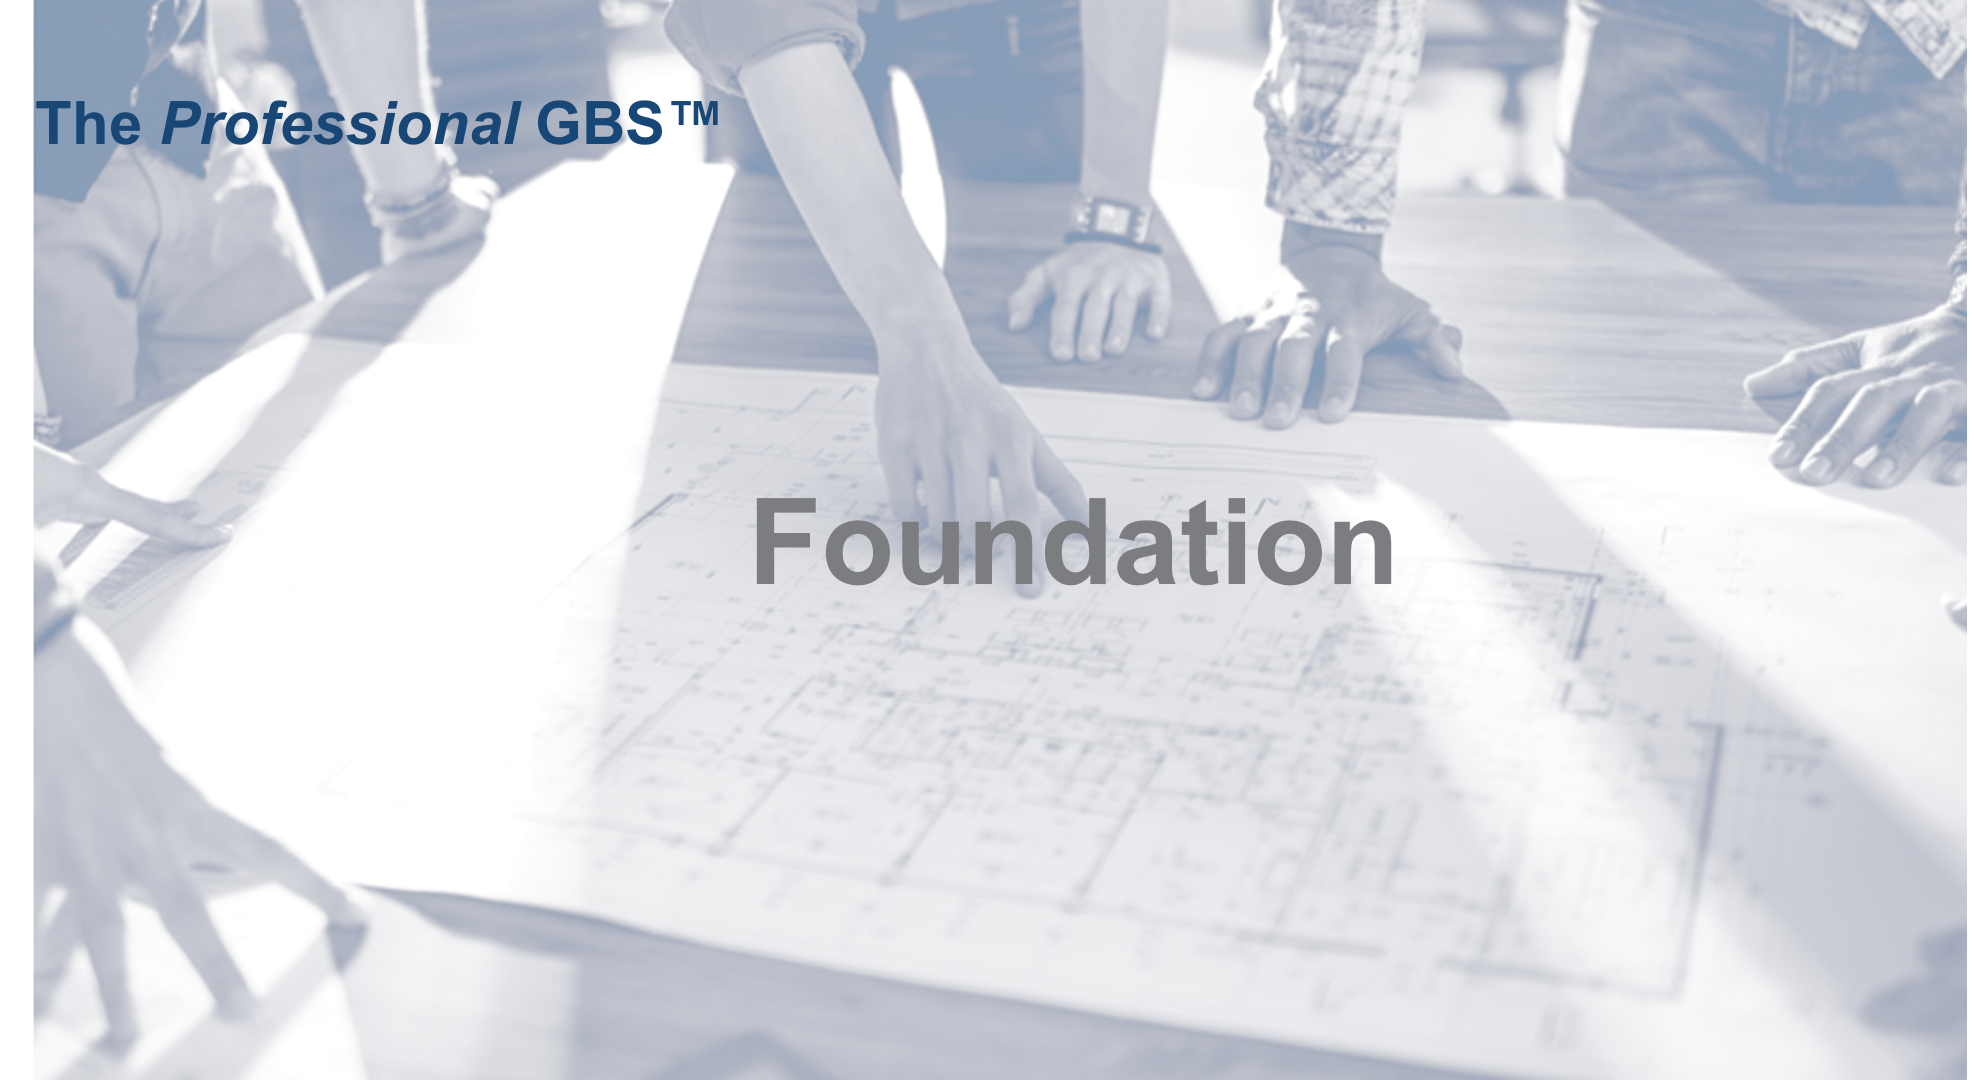 ASDA-2020-FO ASDA 2020-pGBS-Foundations